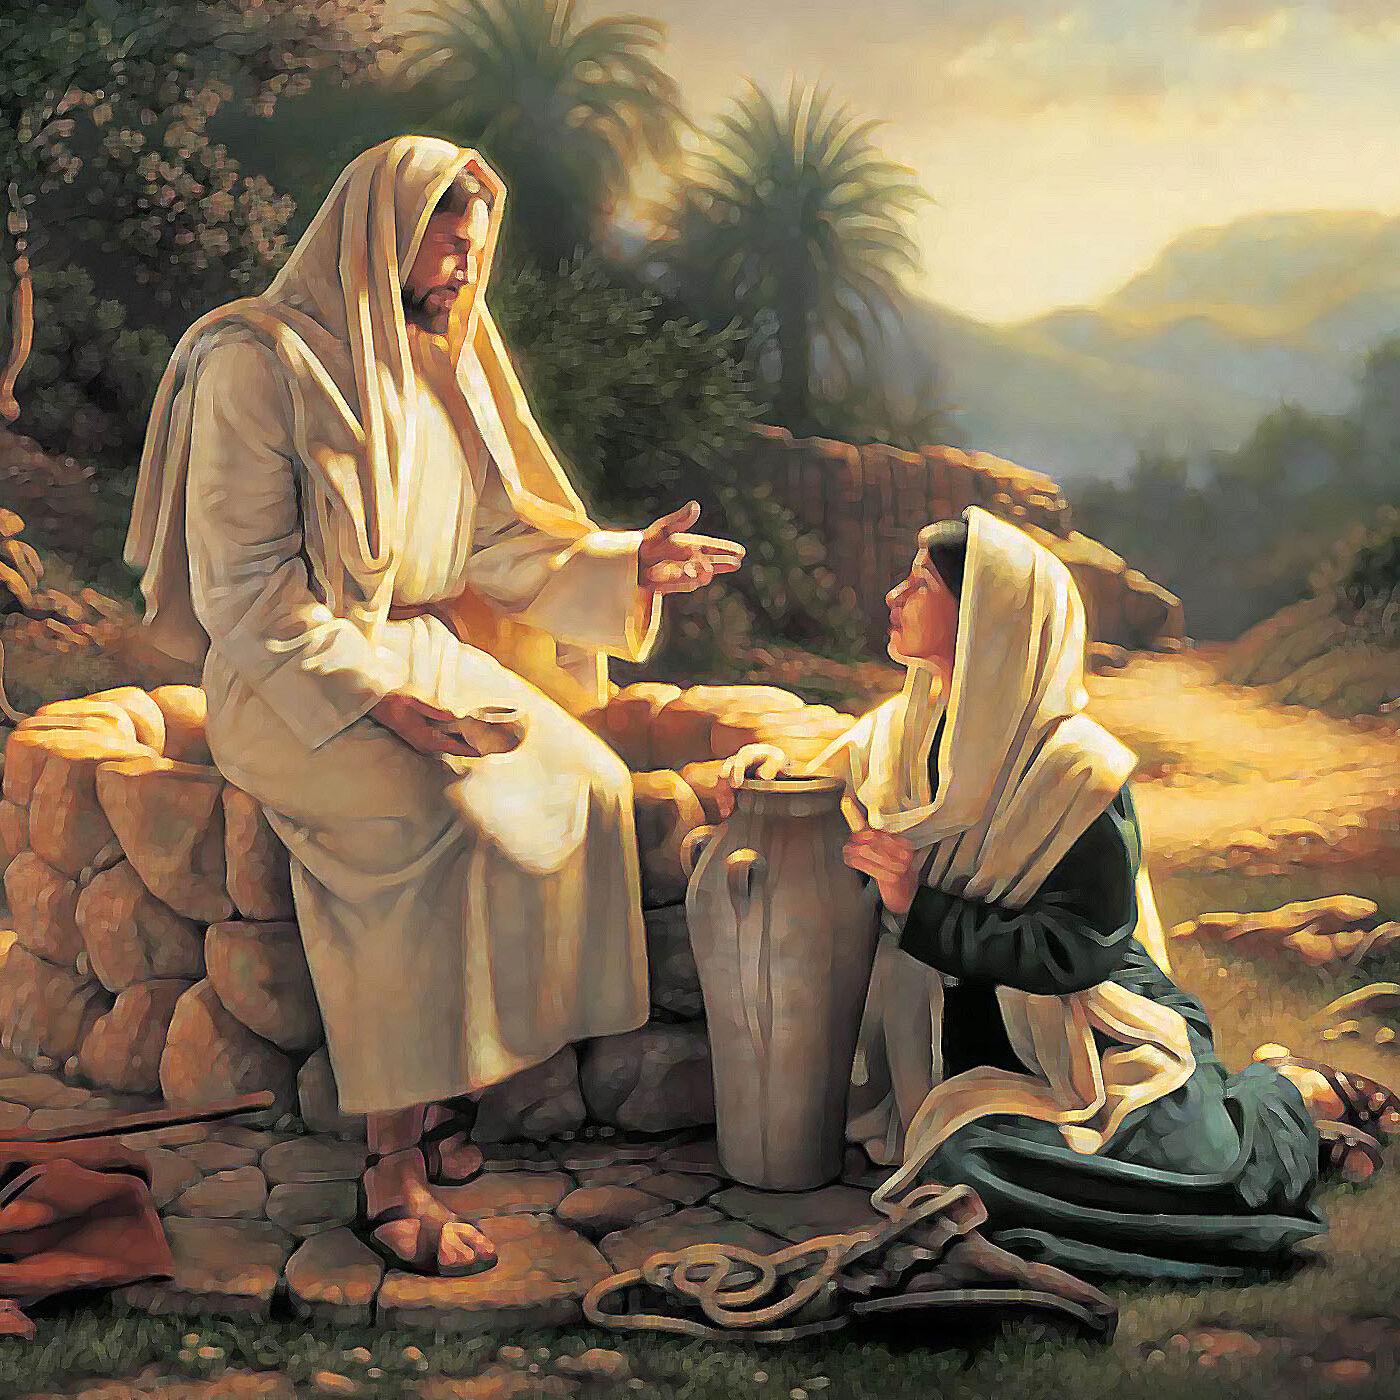 riflessioni sul Vangelo di Martedì 19 Gennaio 2021 (Mc 2, 23-28) - Apostola Loredana